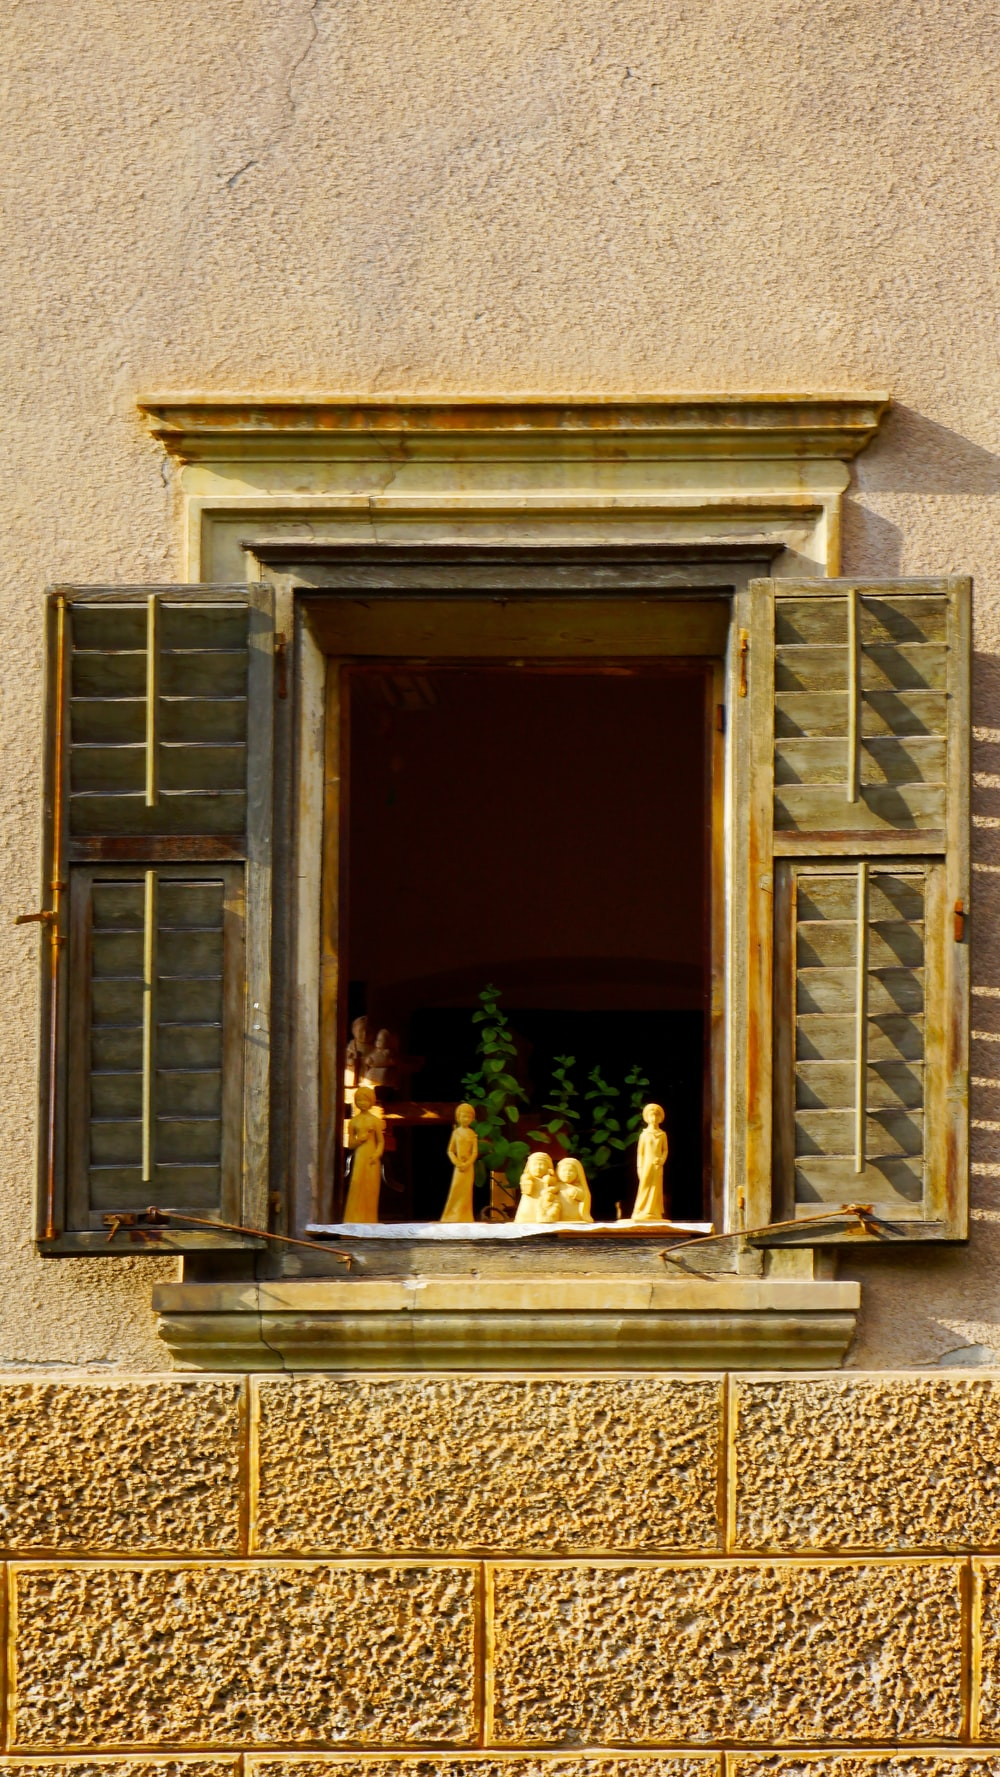 white figurine on window